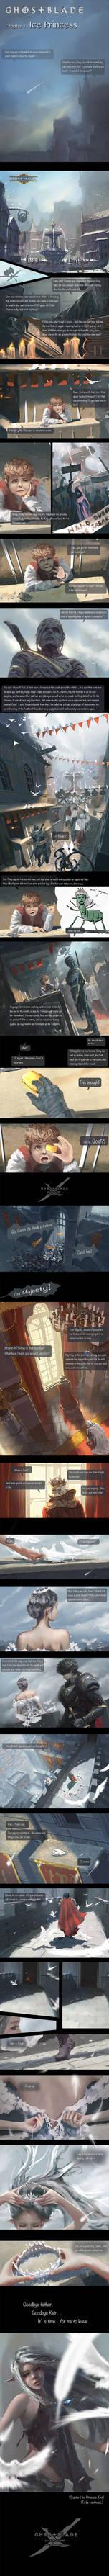 GhostBlade - Chapter 1 : Ice Princess